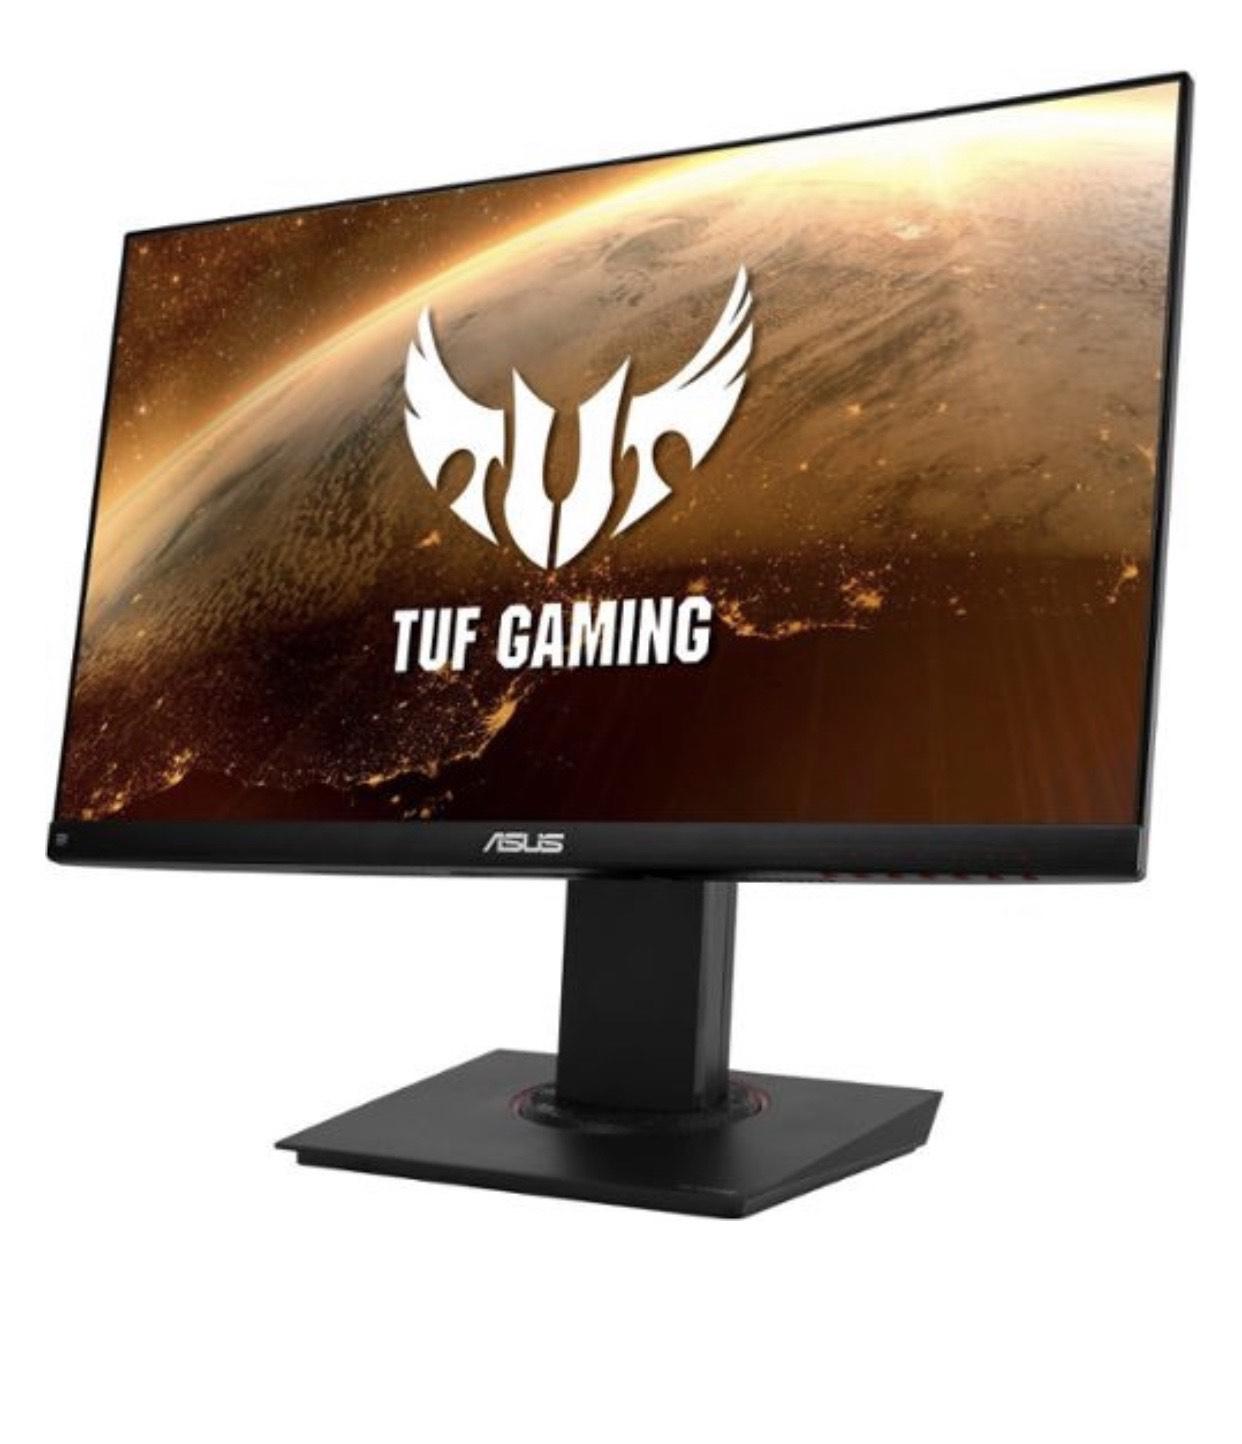 "Ecran PC 24"" Asus VG249Q - 1 ms, Dalle IPS 144 Hz, FreeSync + Adaptive Sync (204€ via RAKUTEN15 + 10.95€ en SuperPoints)"